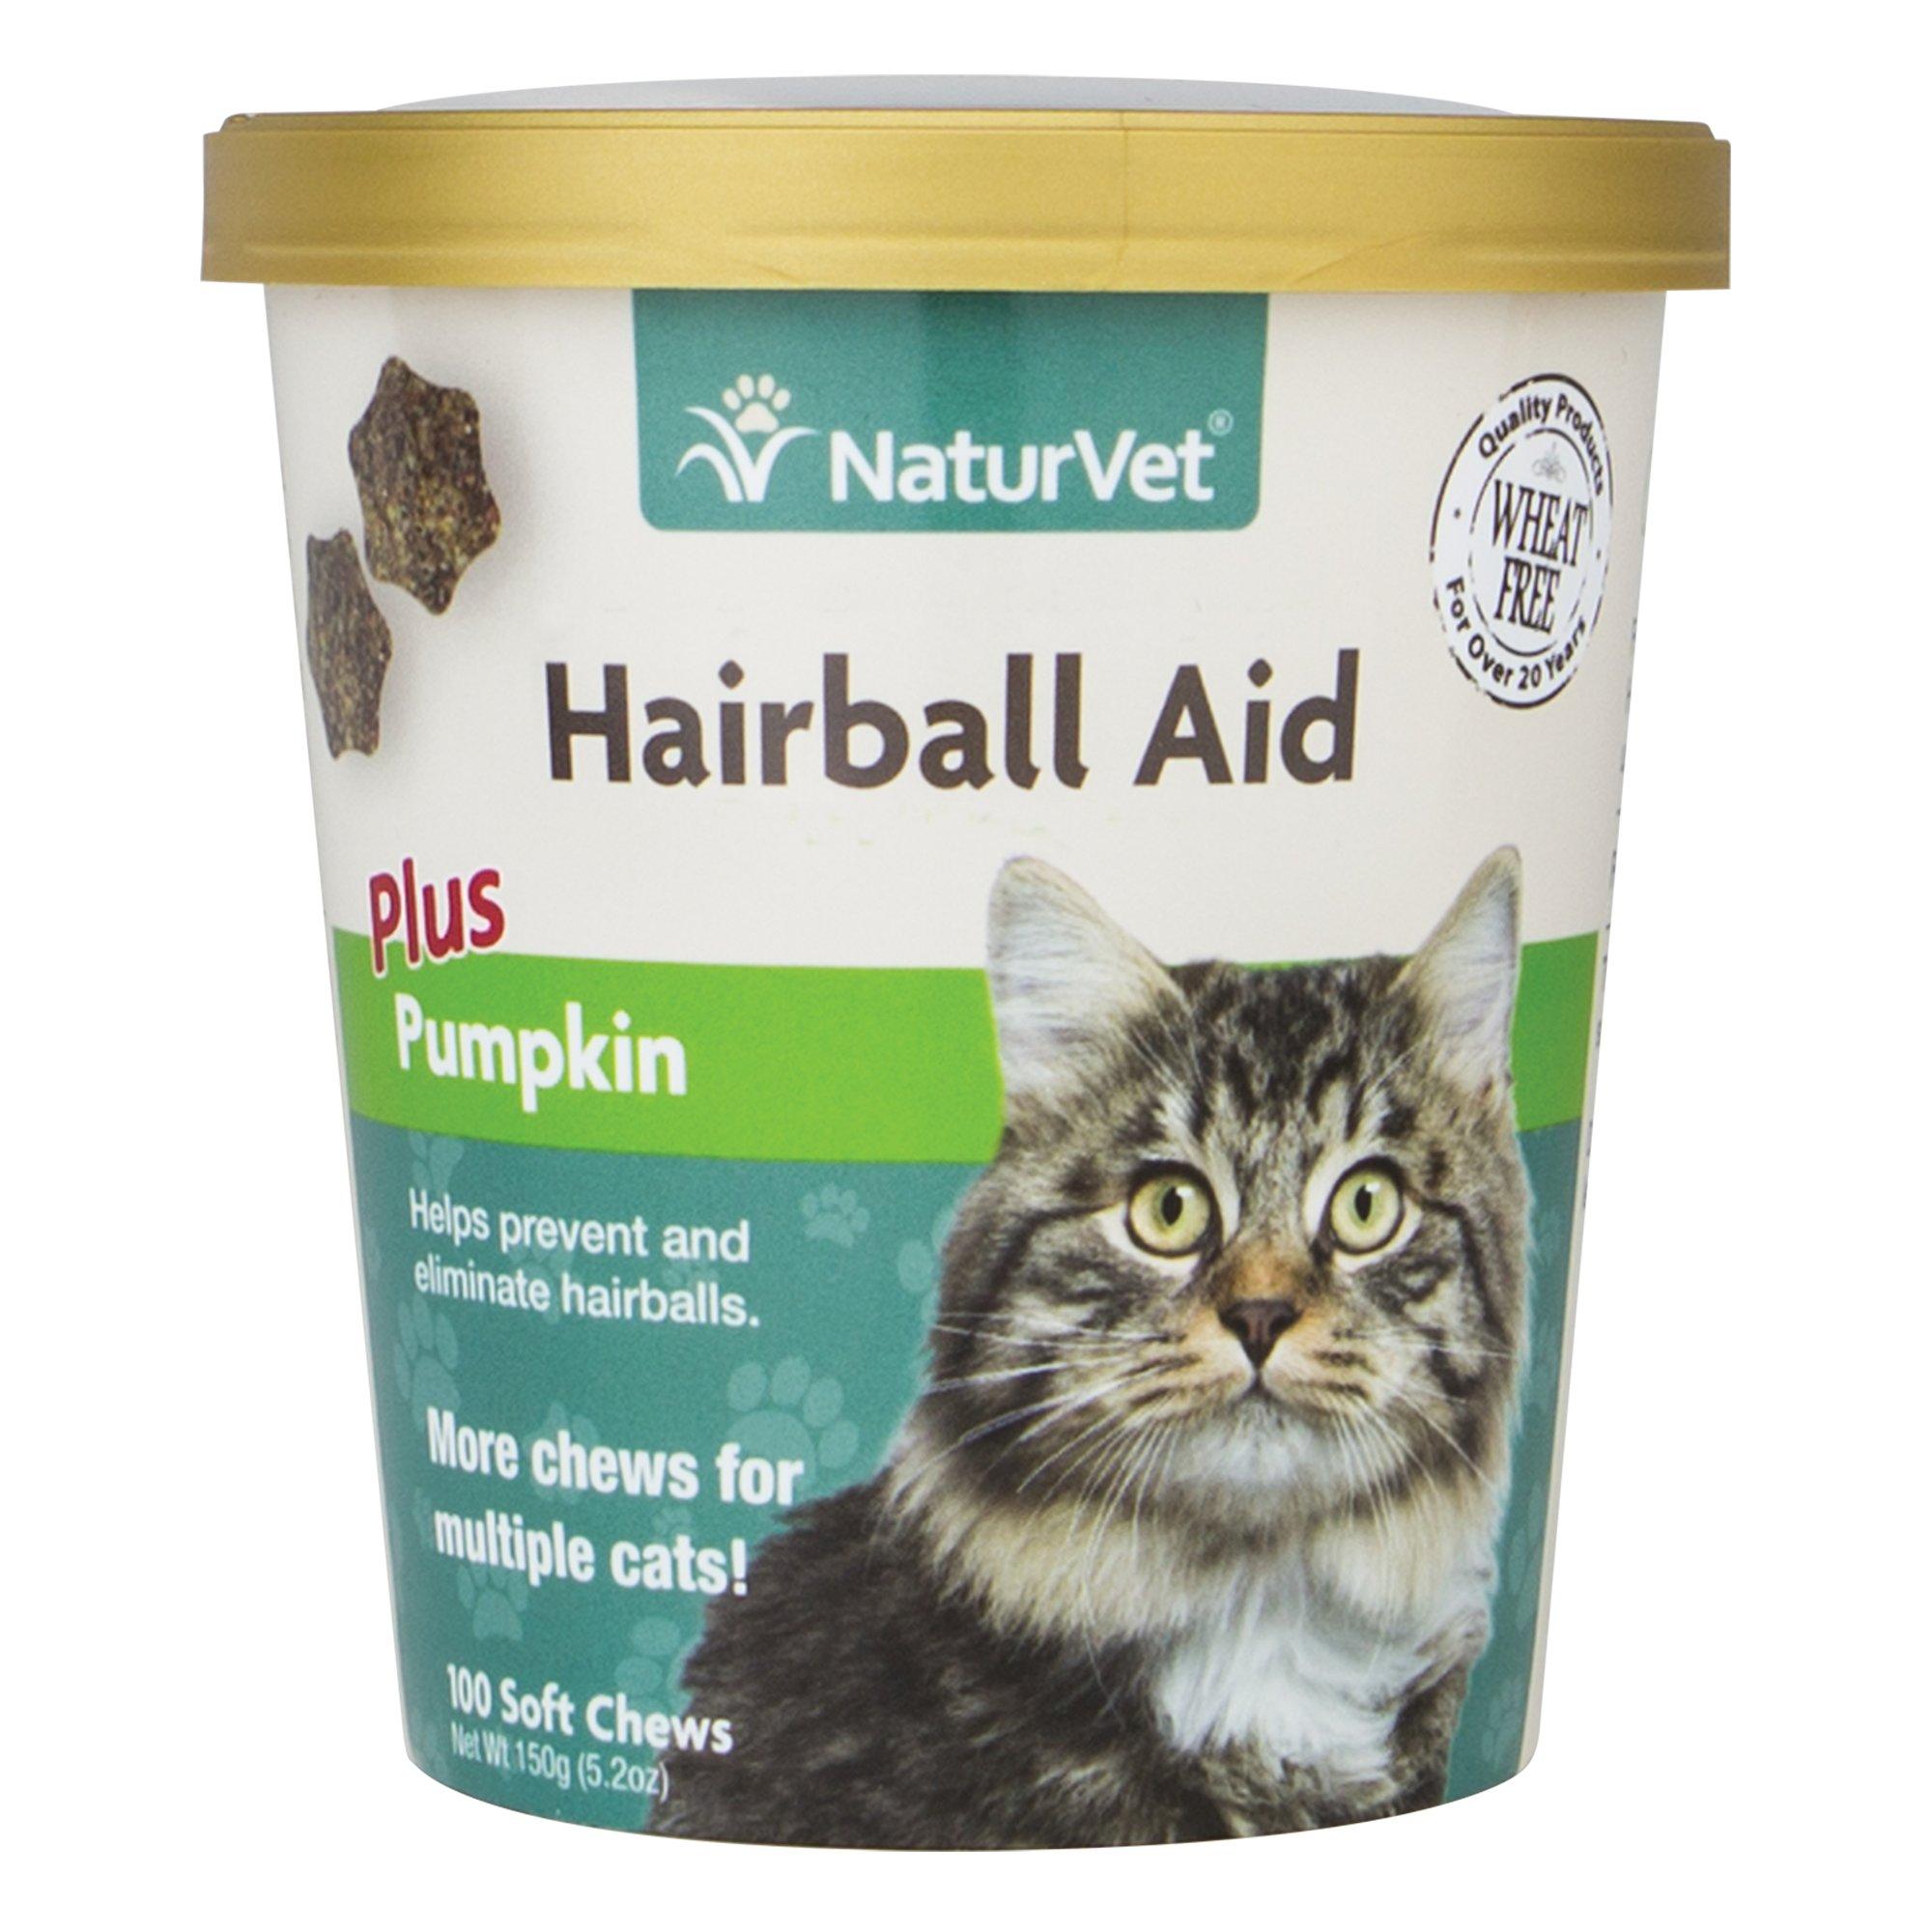 NaturVet Cat Hairball Aid Supplement, Pack of 100 Soft